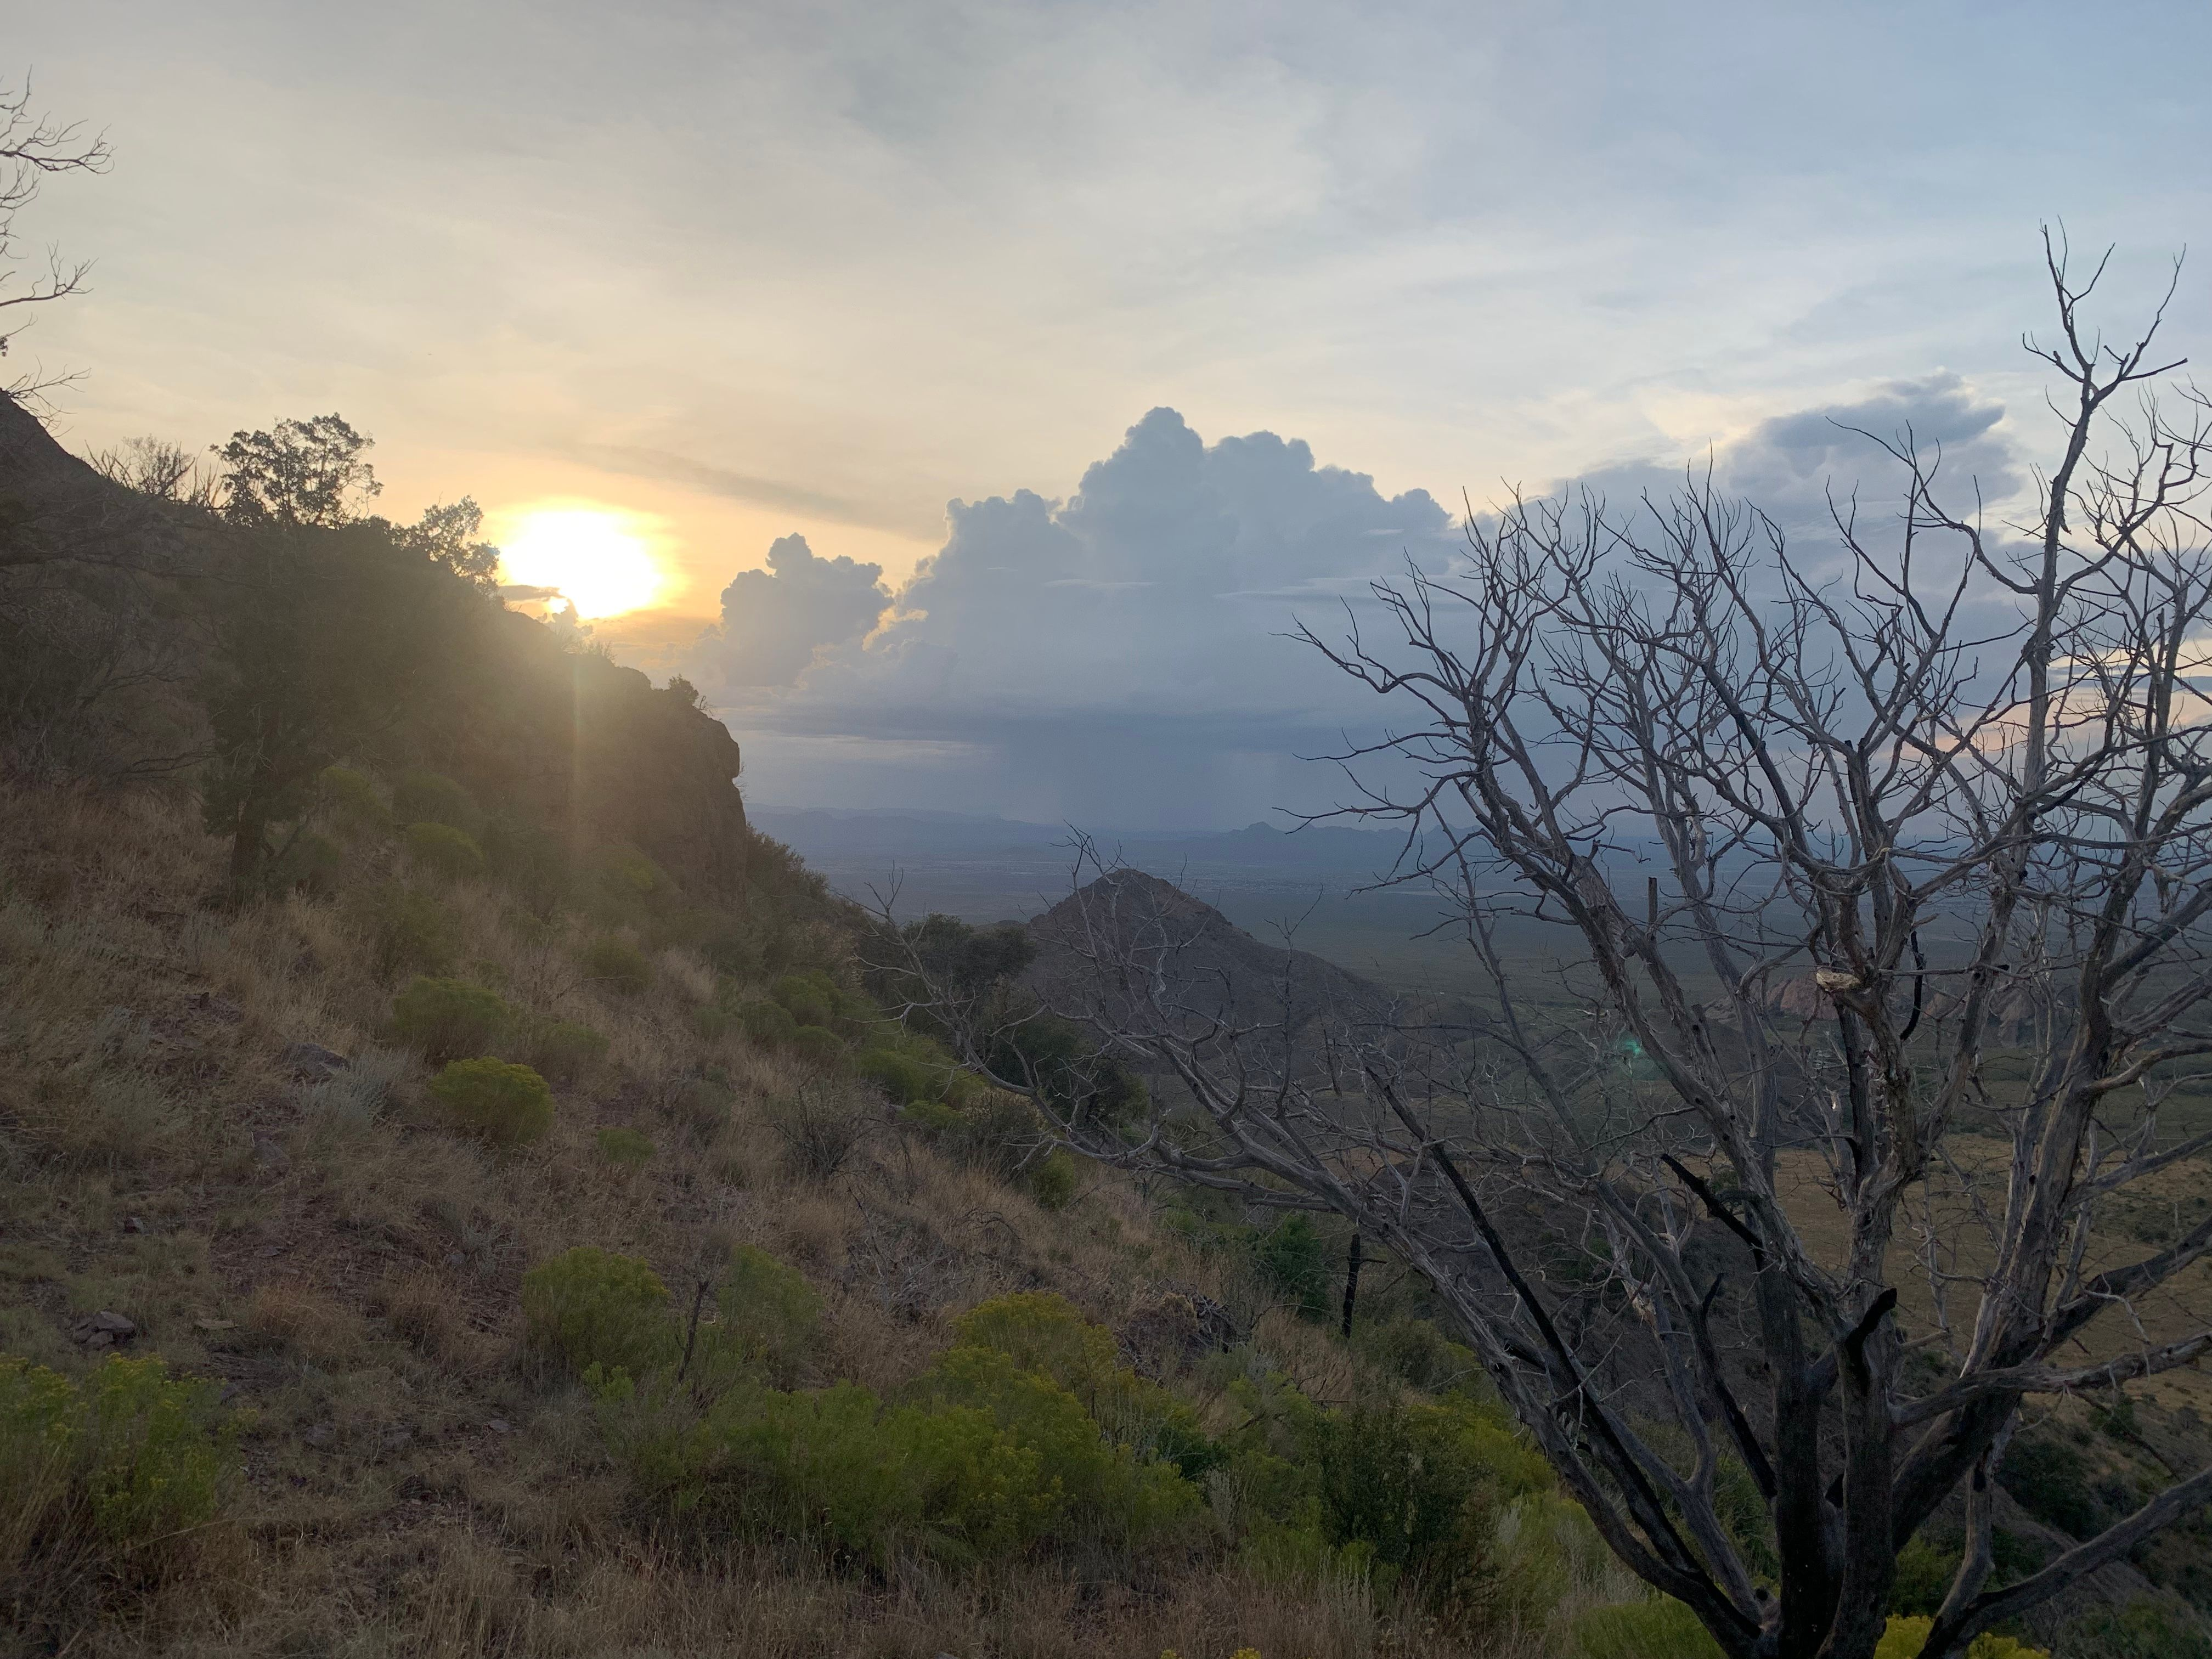 Jornada Hiking & Outdoors Club